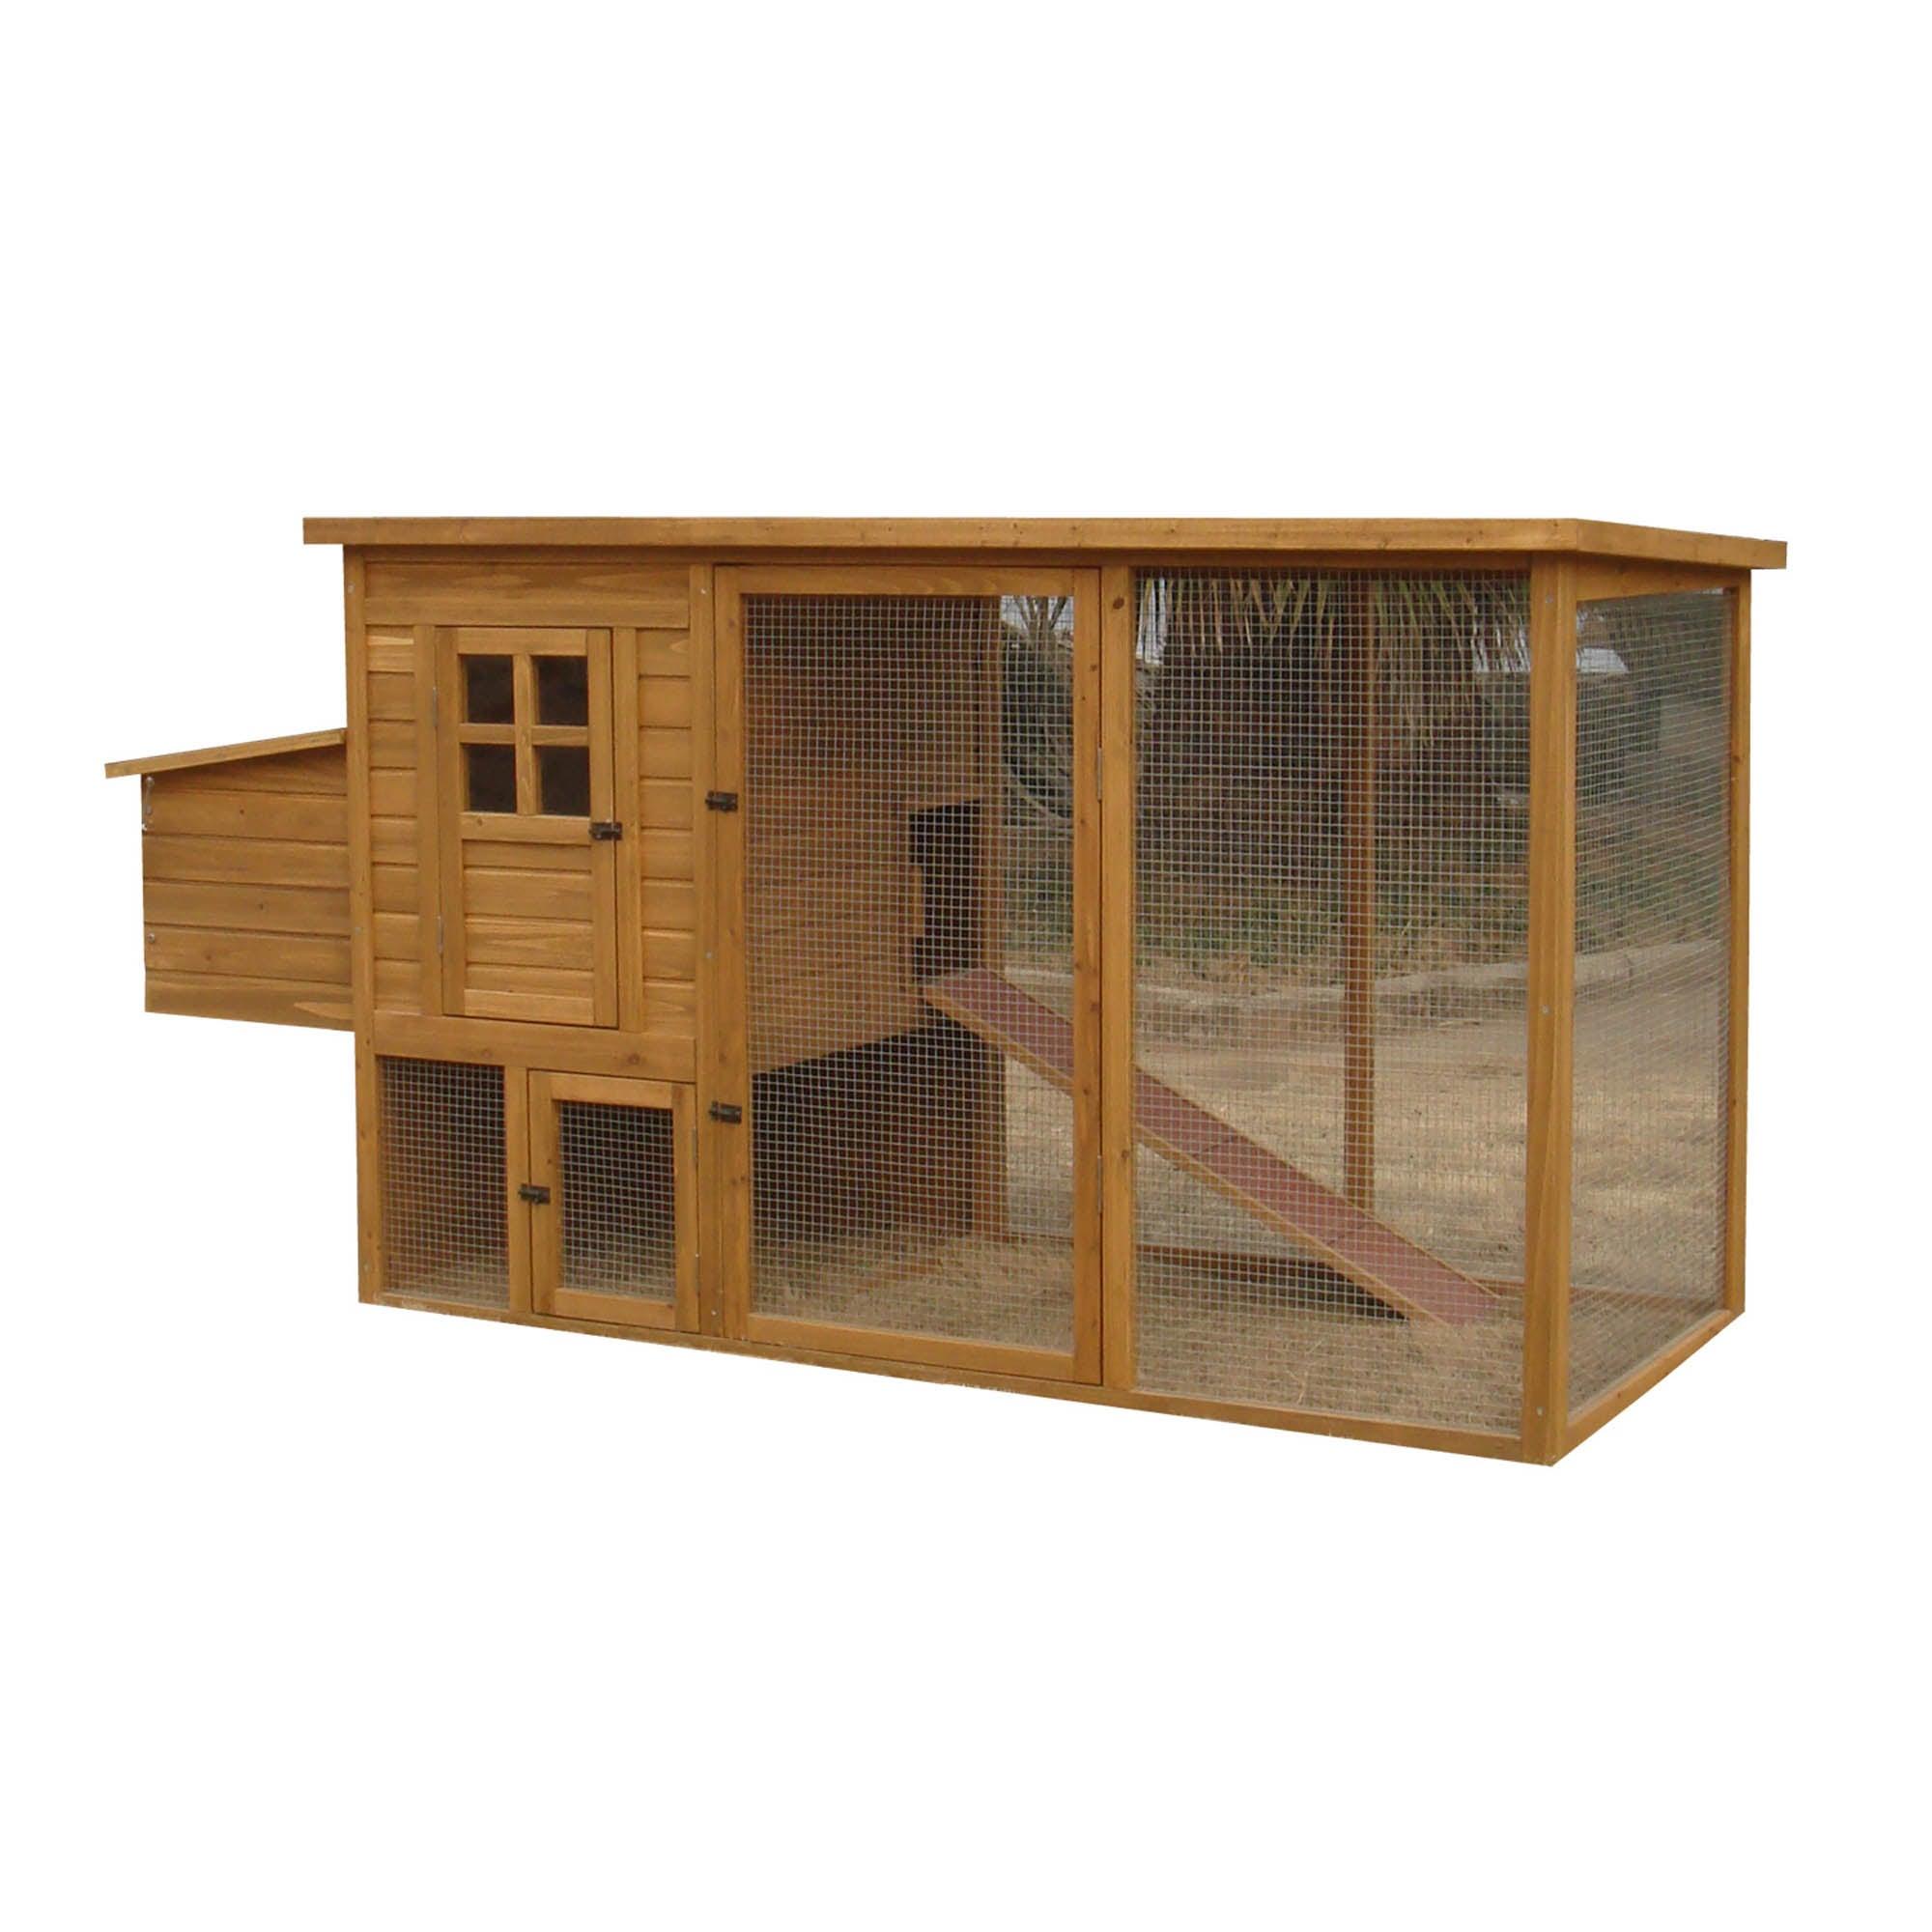 Medium Chicken Coop with Flat Roof Pine (Brown)